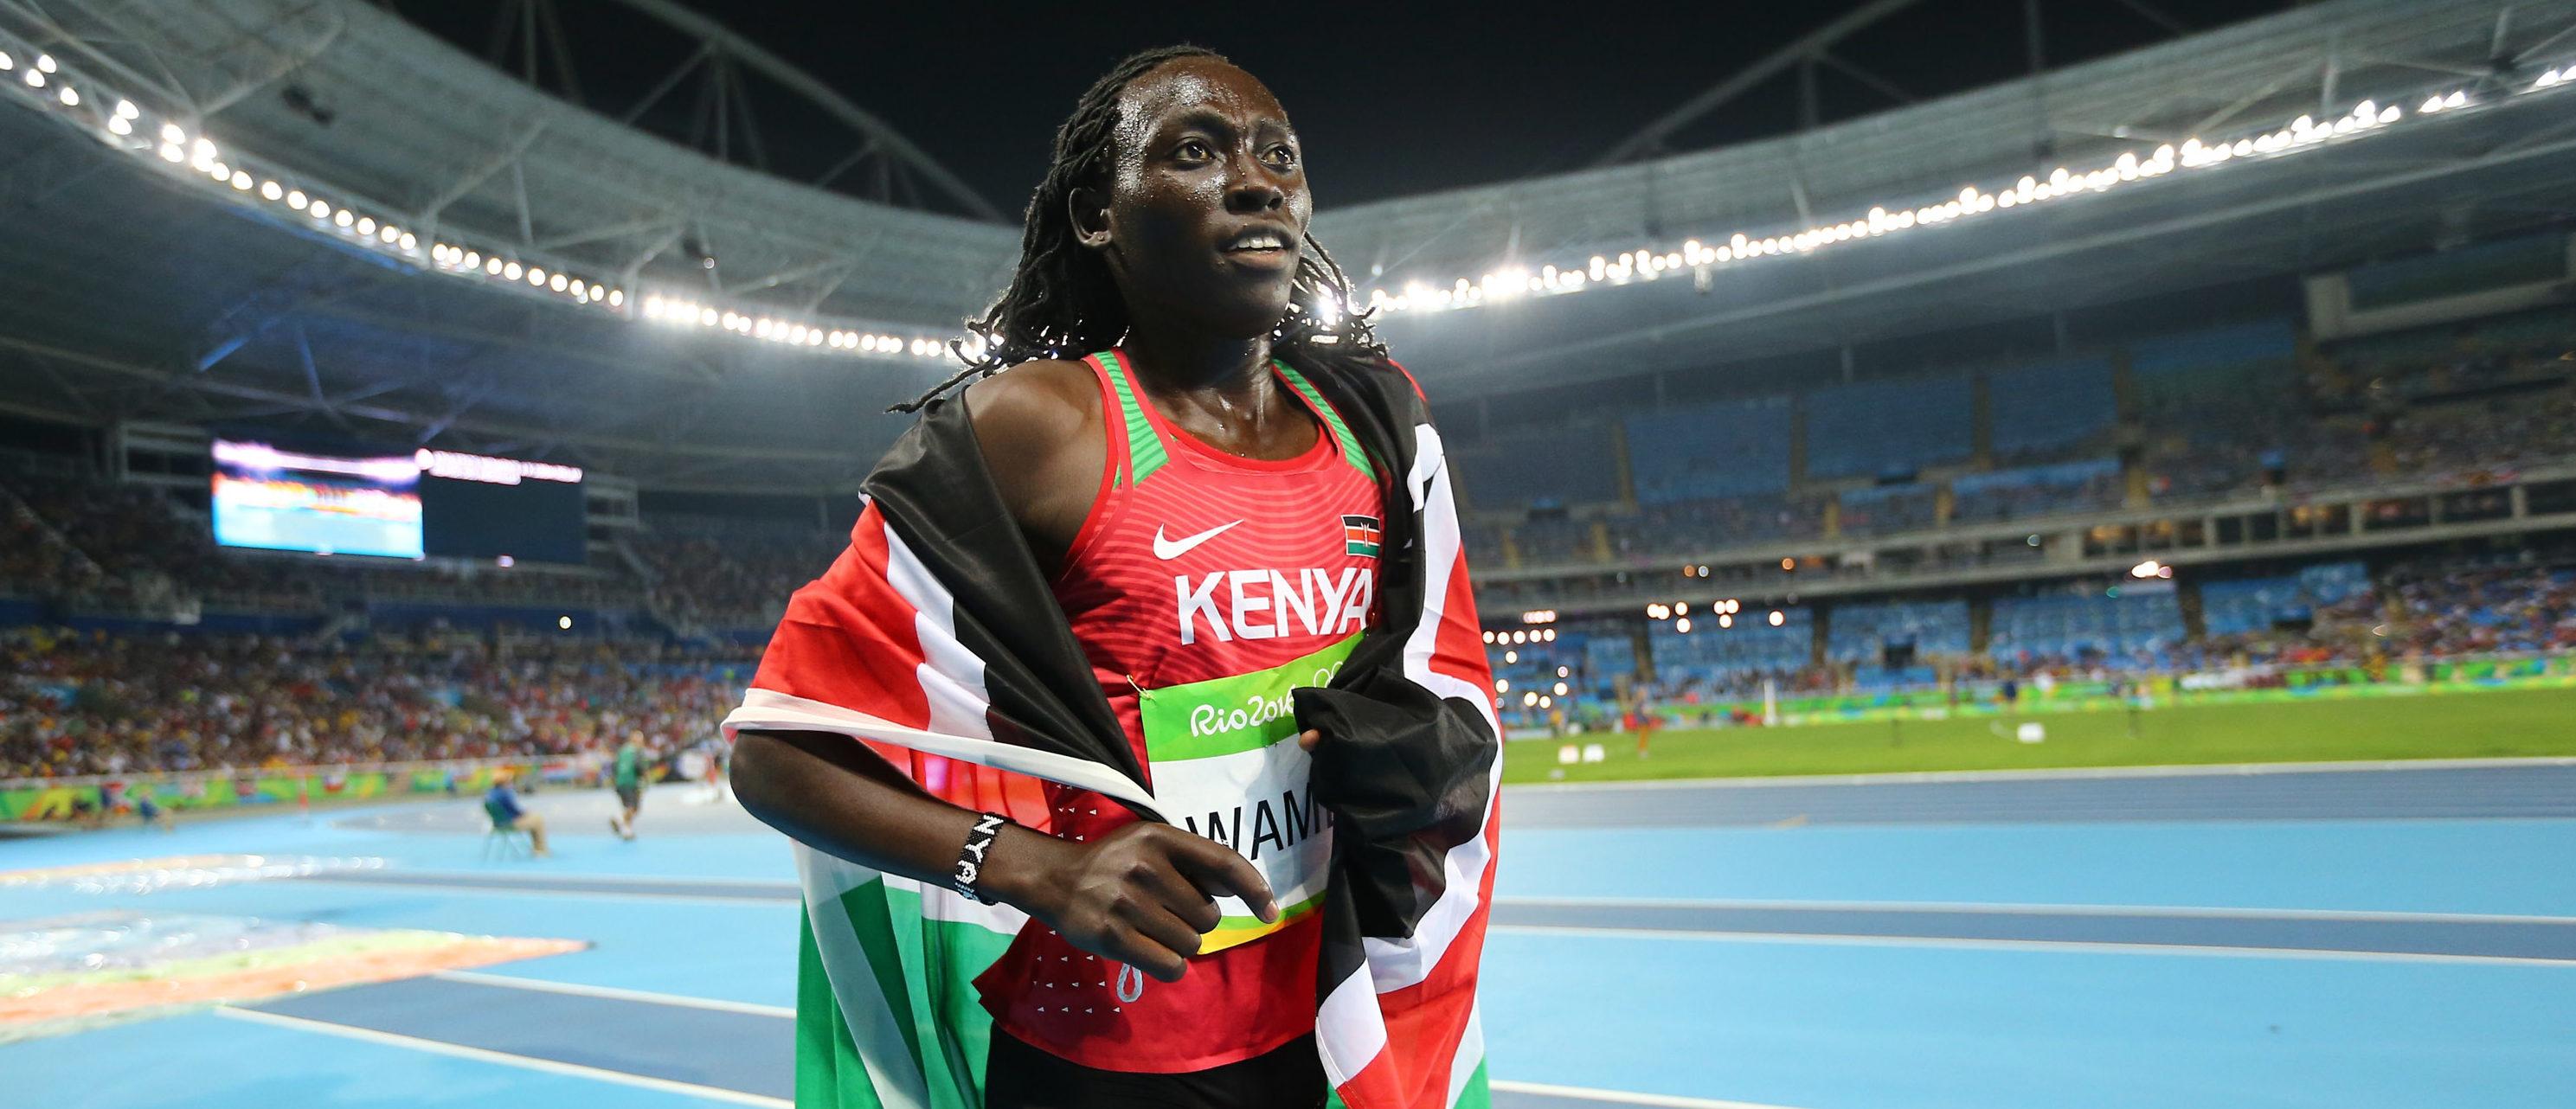 2016 Rio Olympics - Athletics - Final - Women's 800m Final - Olympic Stadium - Rio de Janeiro, Brazil - 20/08/2016. Margaret Wambui (KEN) of Kenya celebrates winning the bronze medal. REUTERS/Dominic Ebenbichler